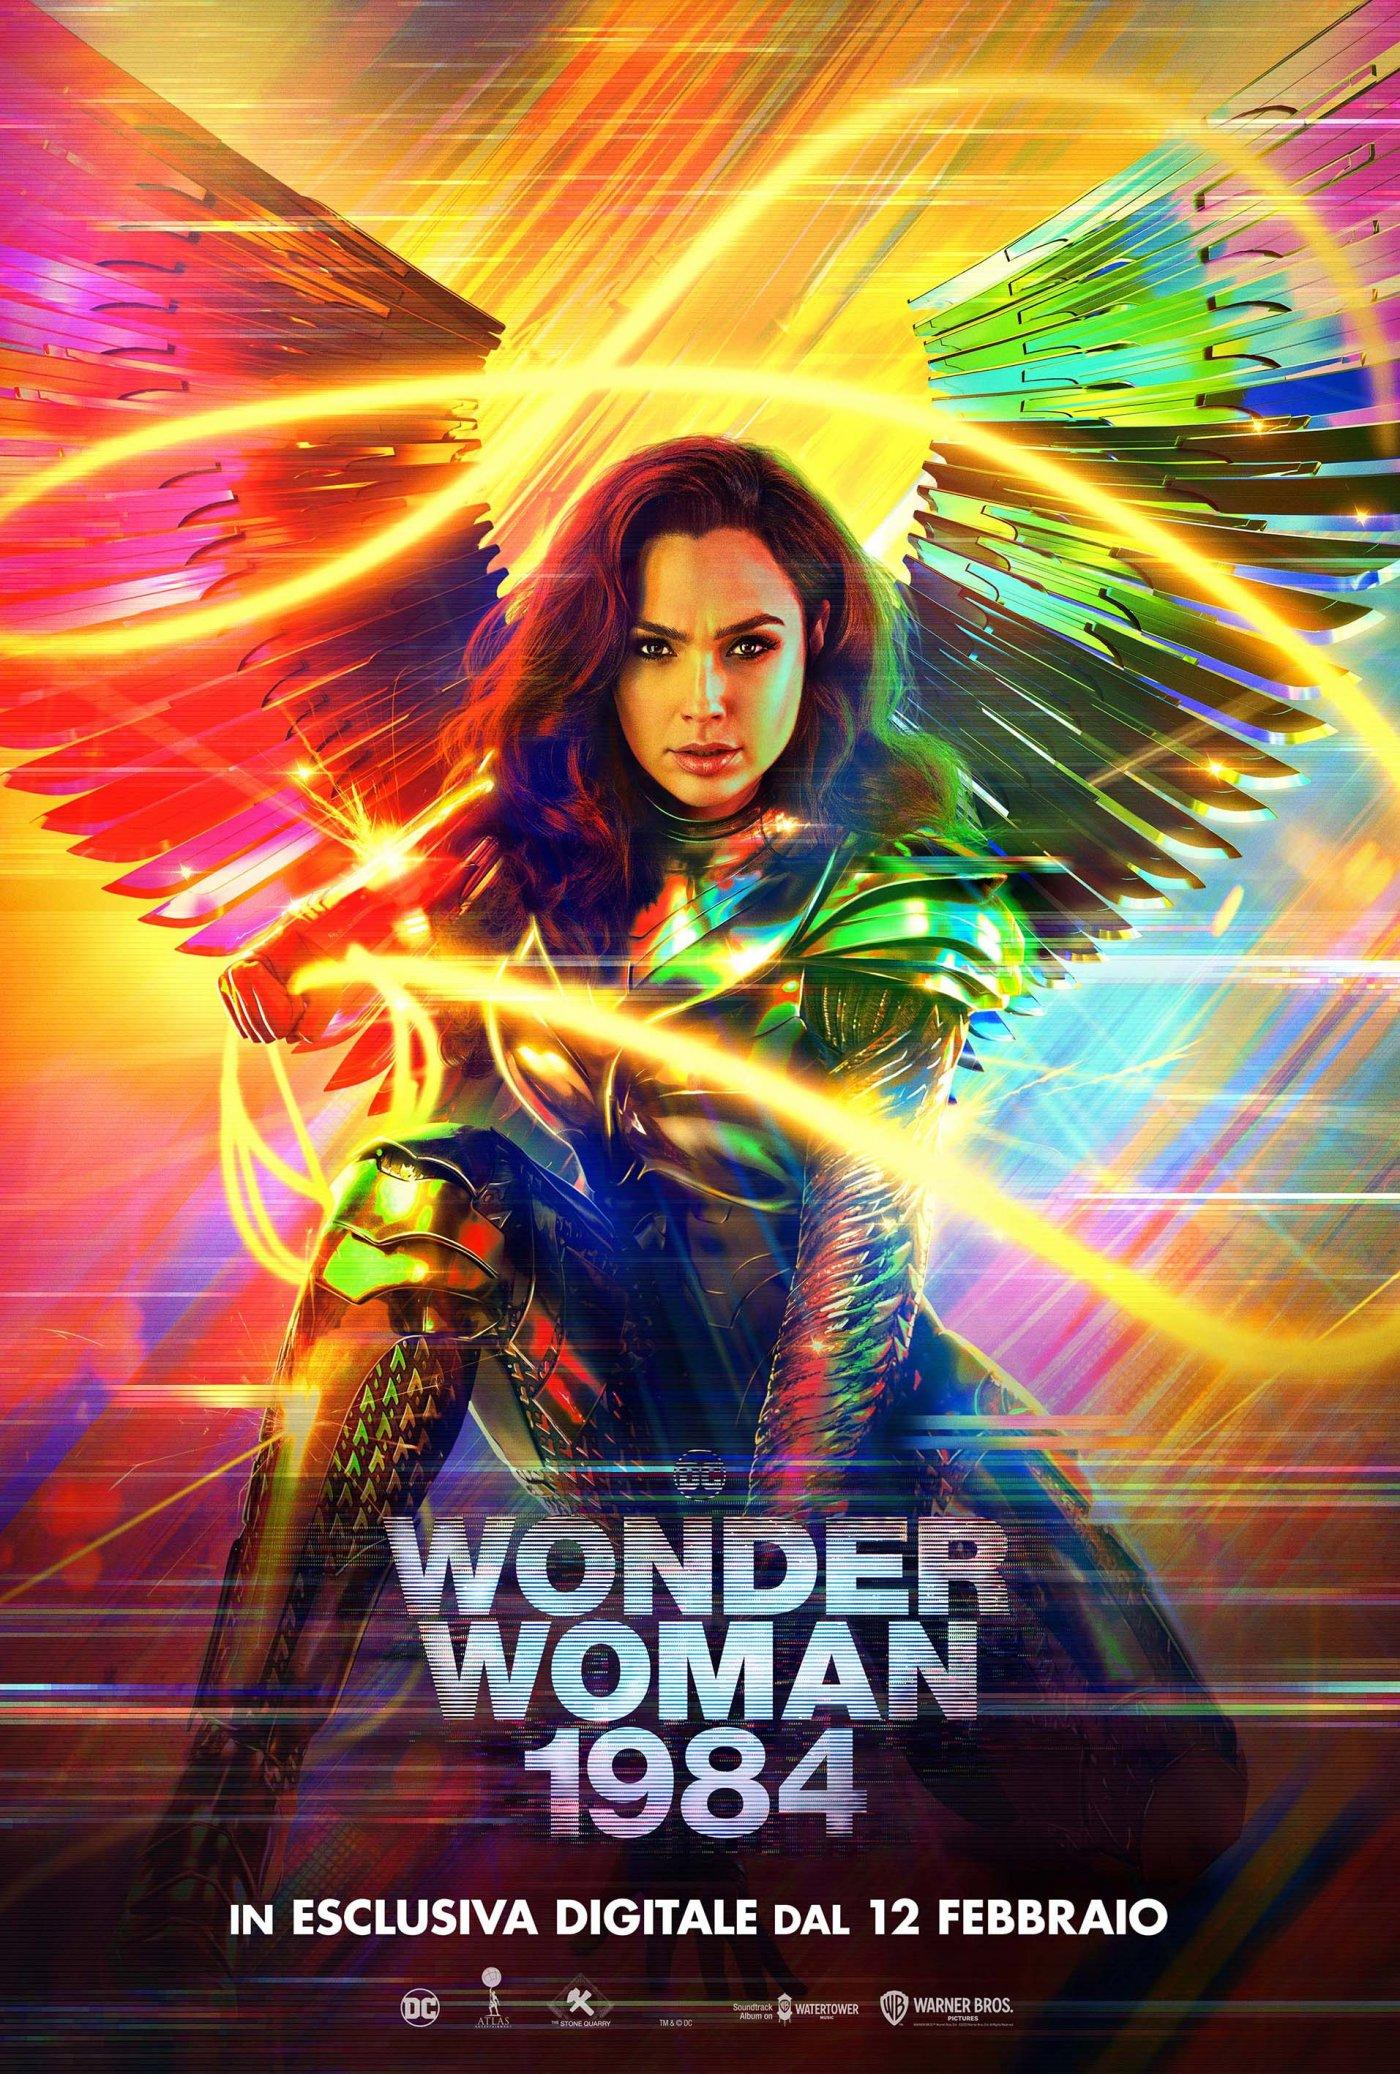 https://movieplayer.it/film/wonder-woman-1984_47706/